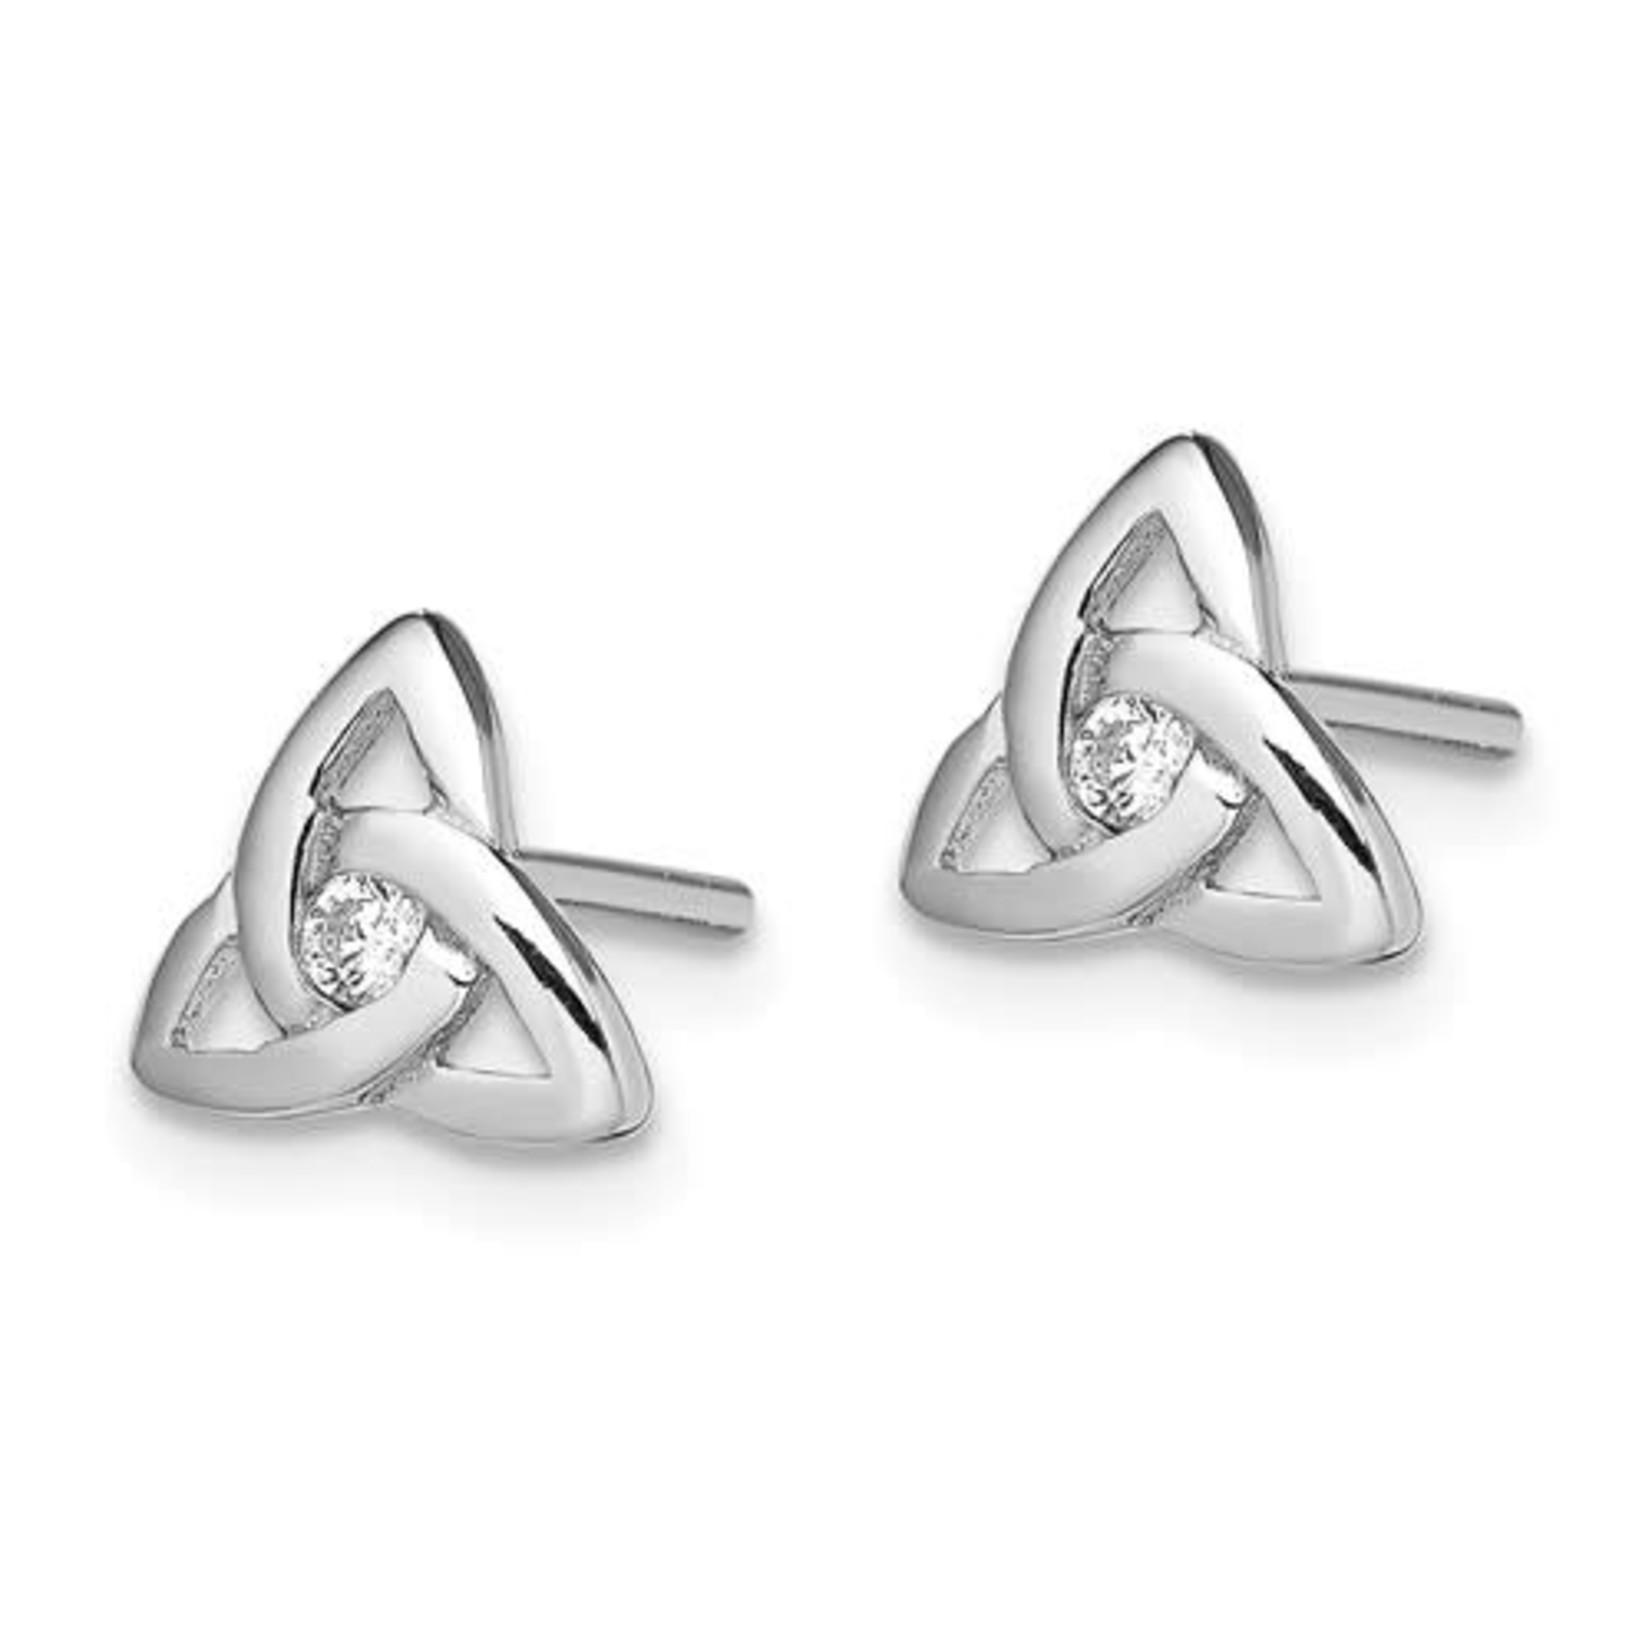 Sterling Silver Celtic Knot Crystal Stud Earrings